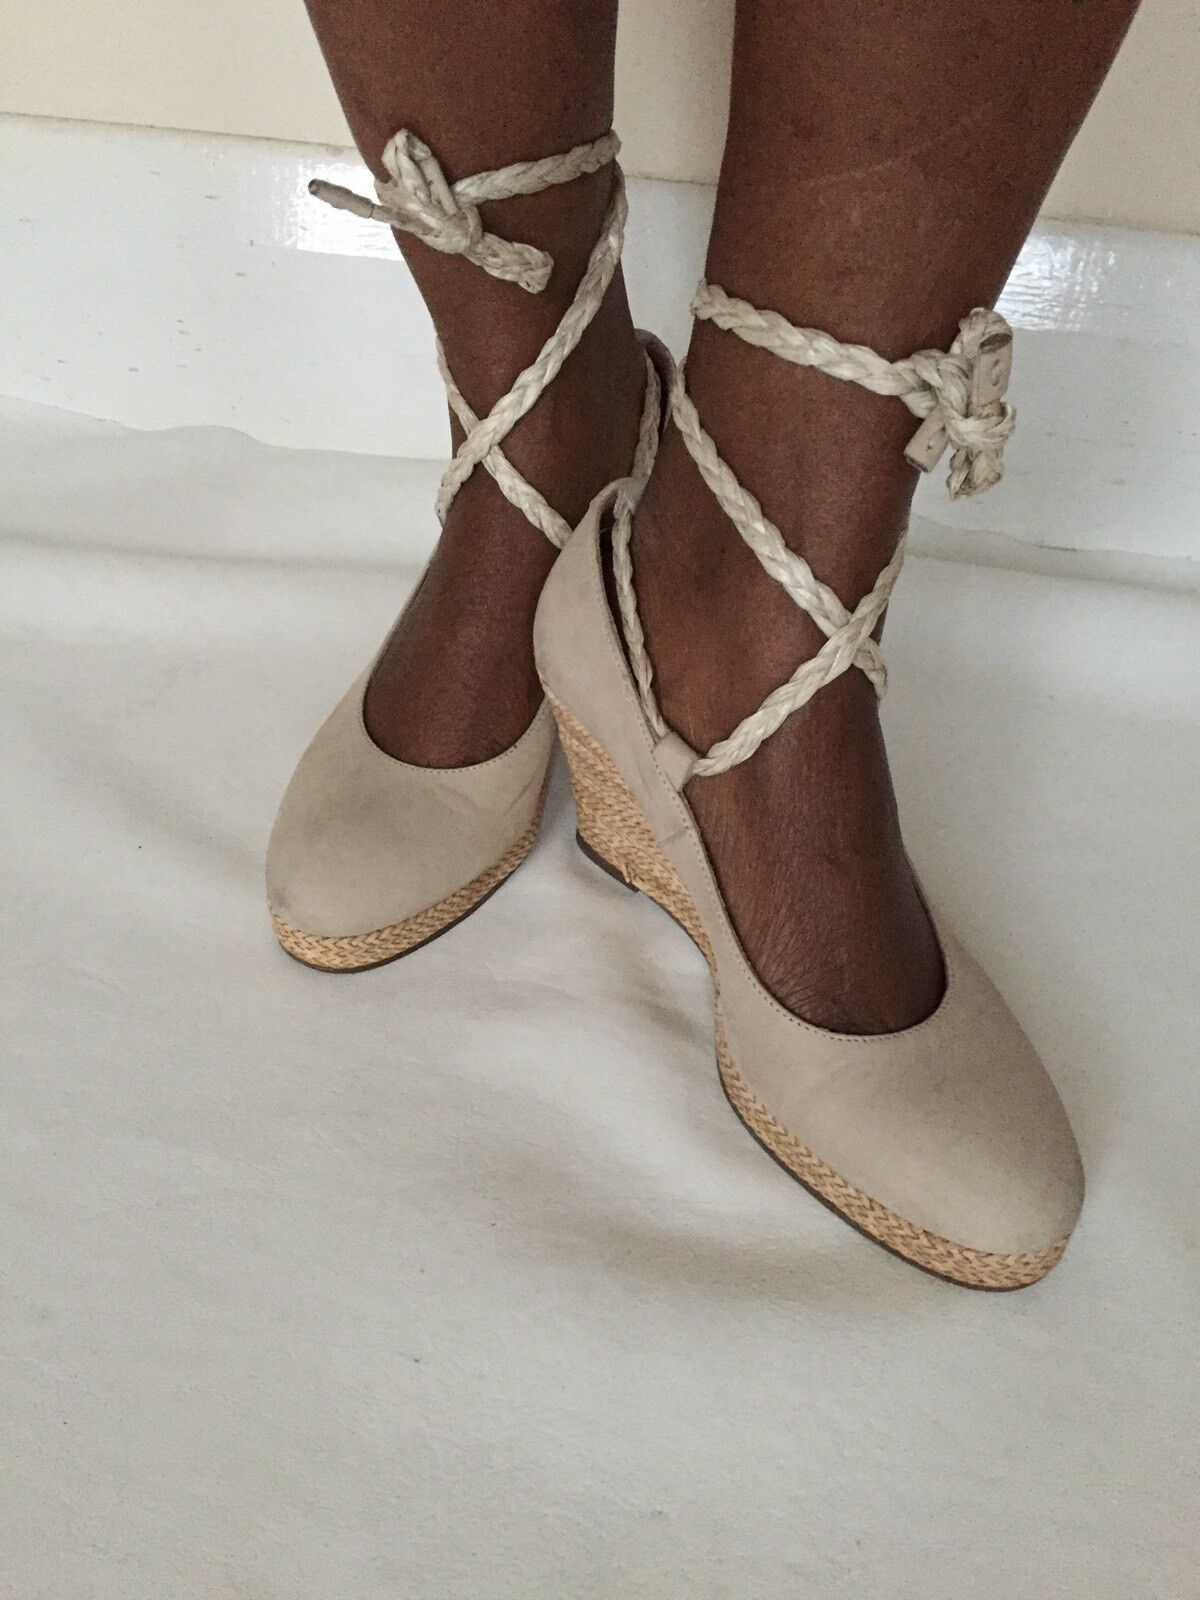 Via Vai Leather Wedge Platform Lace Up Straw Knit Espadrilles shoesBeach Beige 3